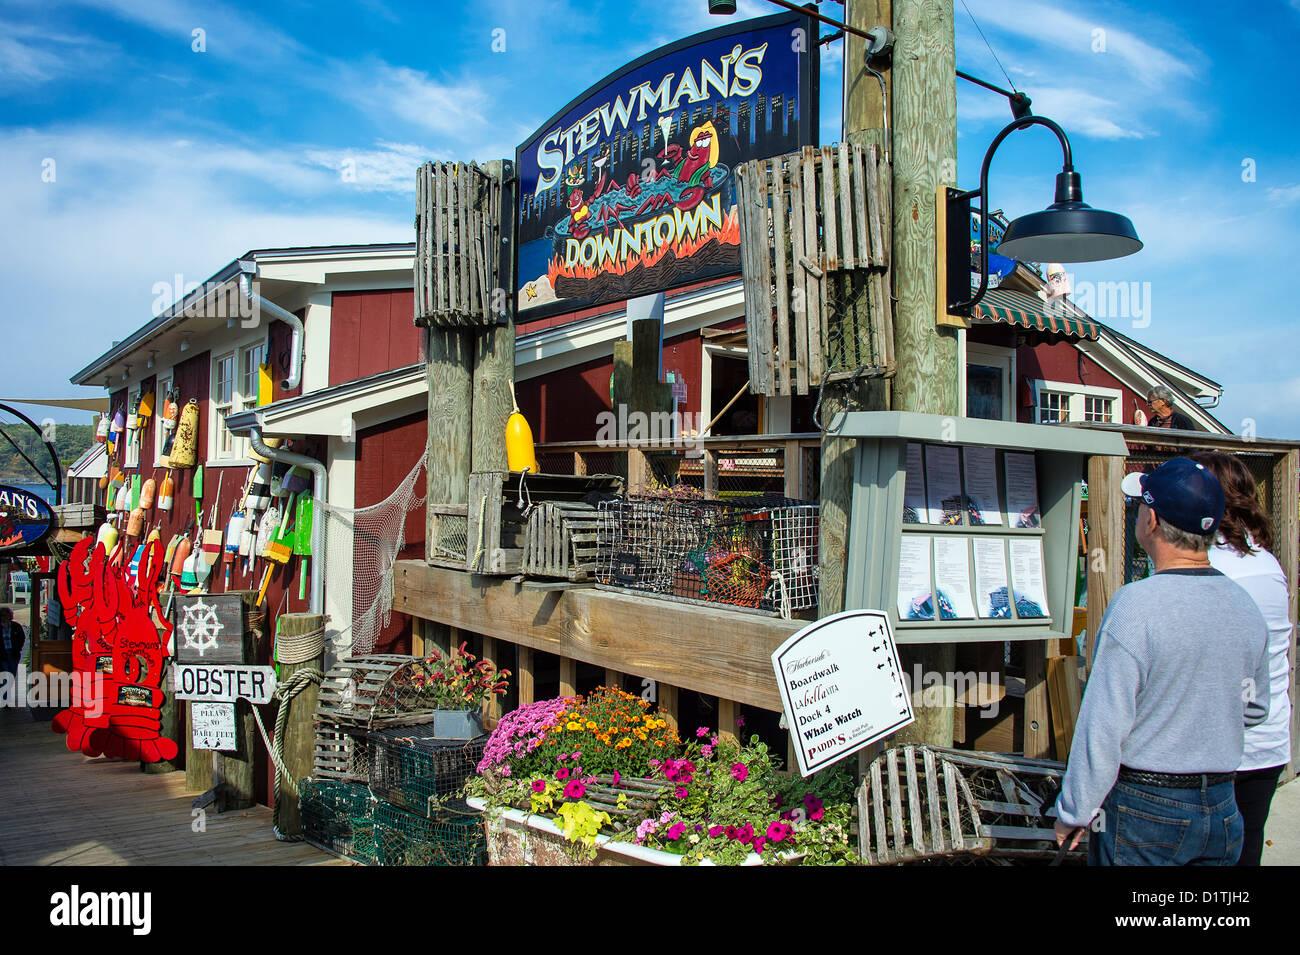 Stewmans Lobster pound, Bar Harbor, Maine, USA Stock Photo: 52787198 - Alamy